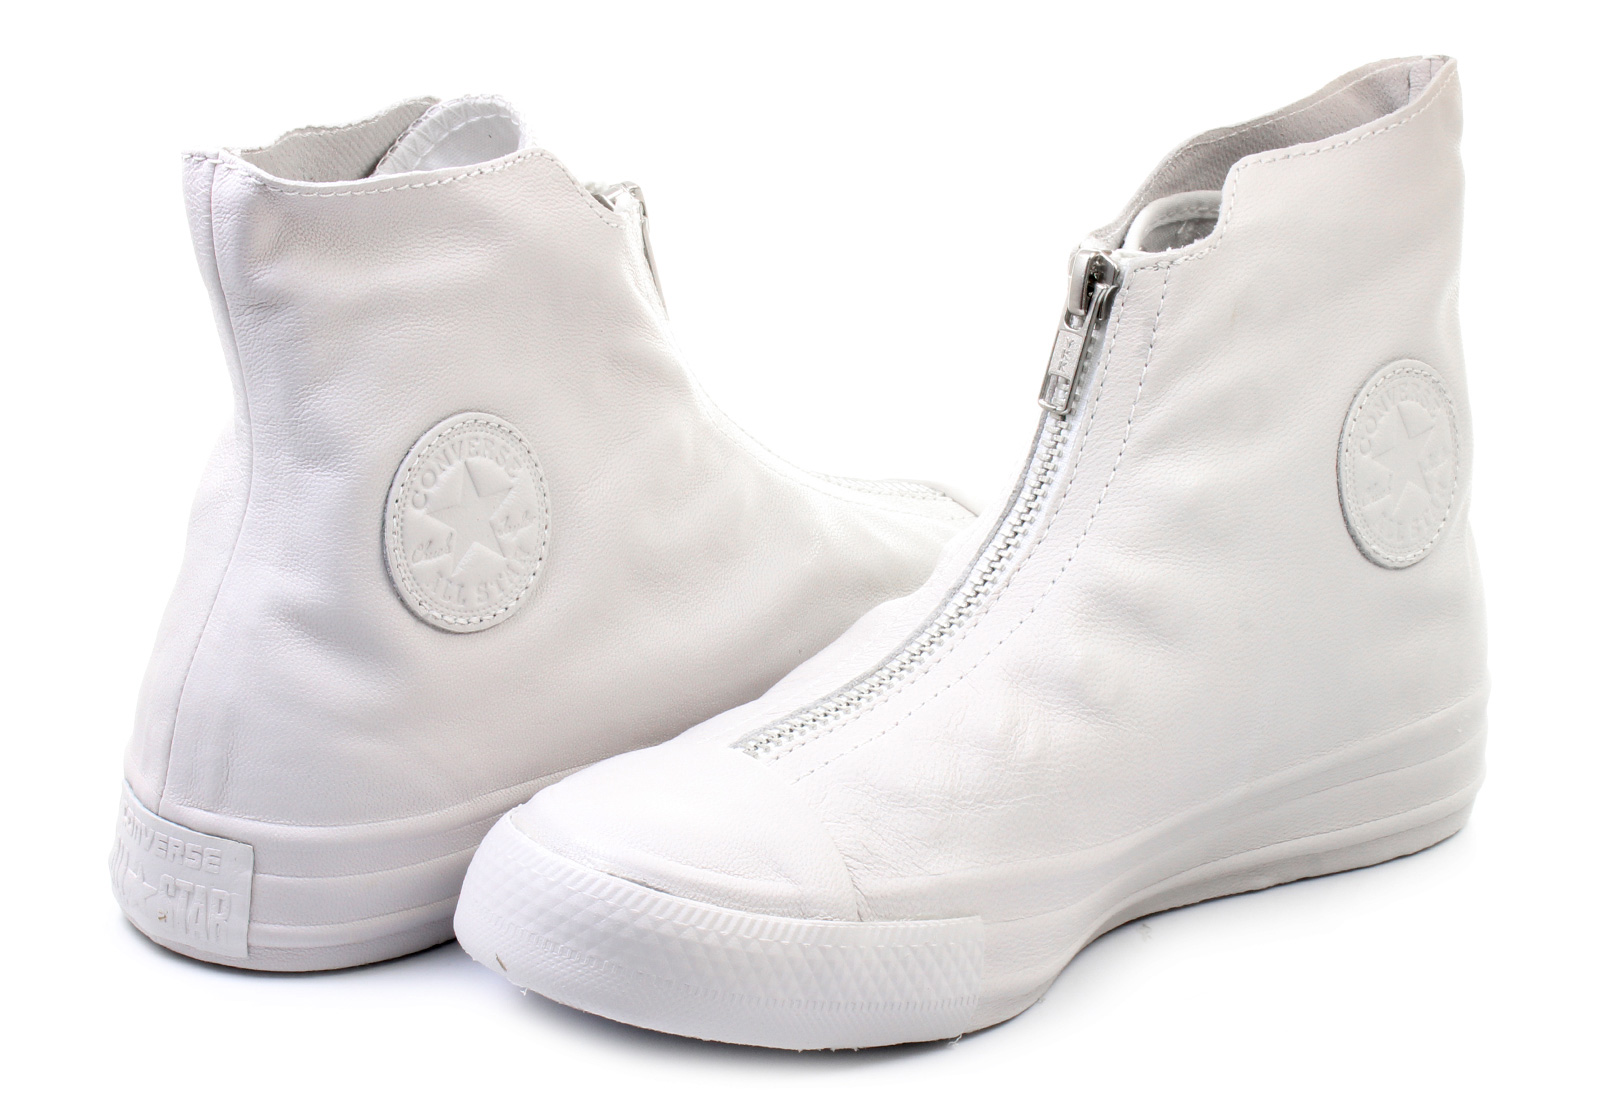 648a3f4d0e2d Converse Sneakers - Chuck Taylor All Star Shroud Leather Hi ...